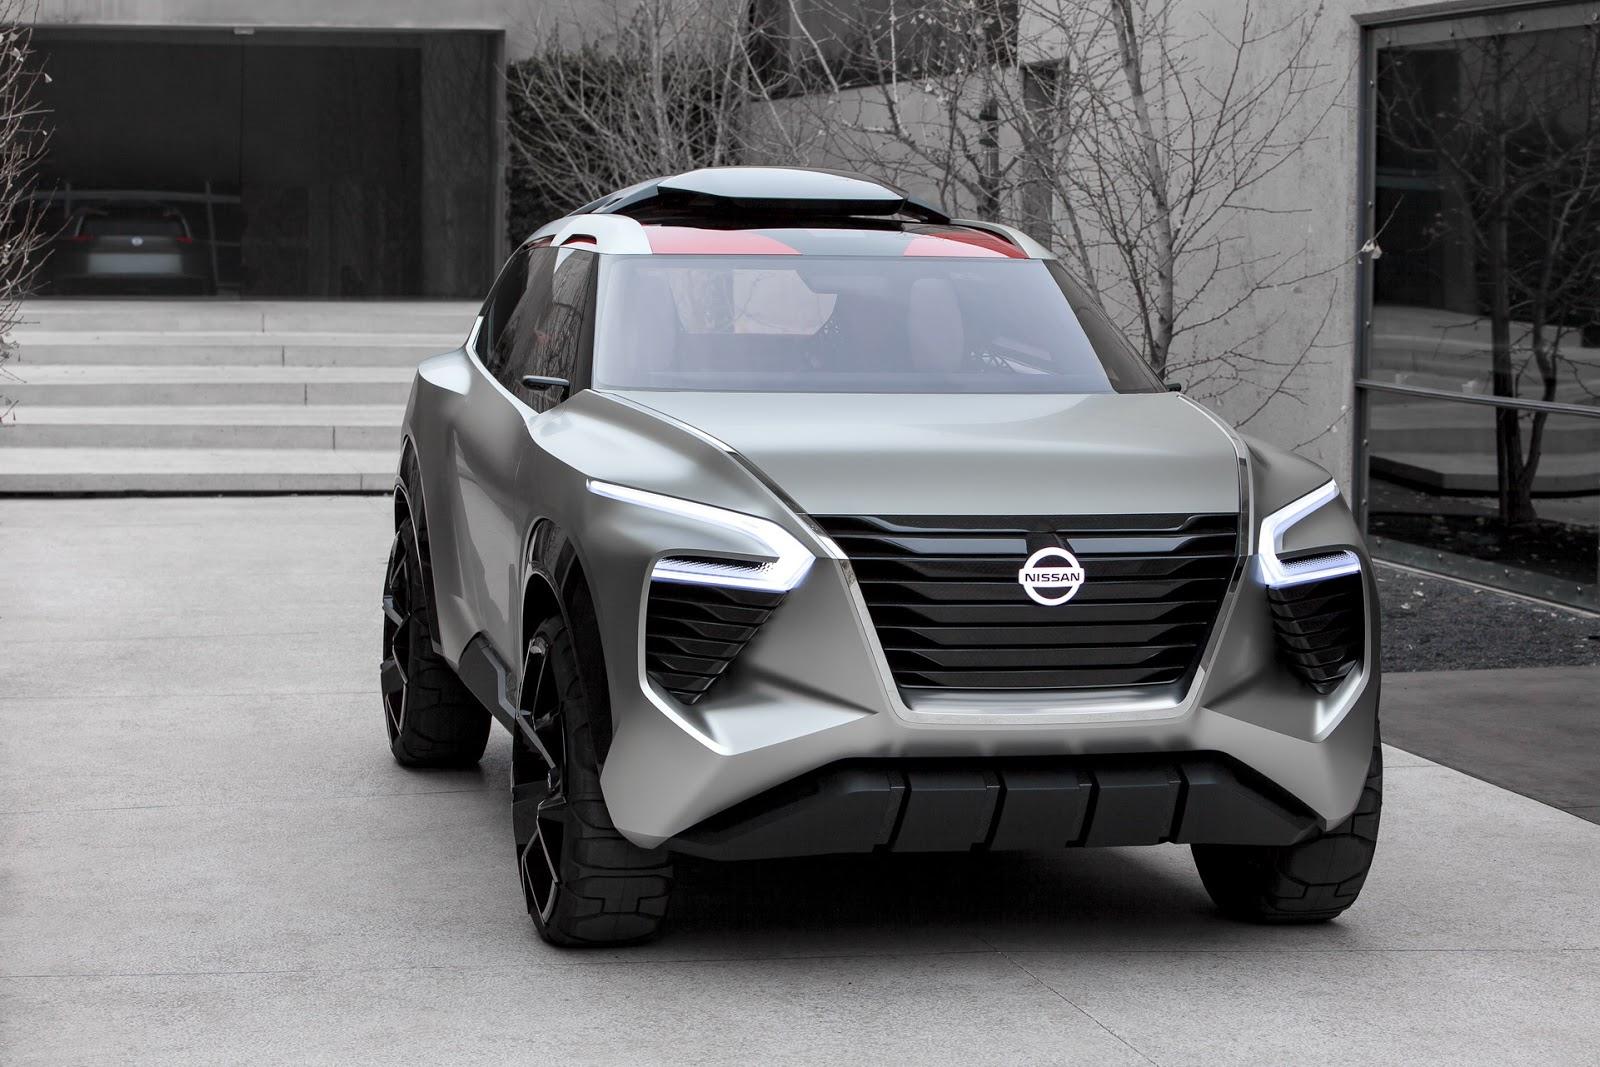 Nissan-Xmotion-Concept-63.jpg